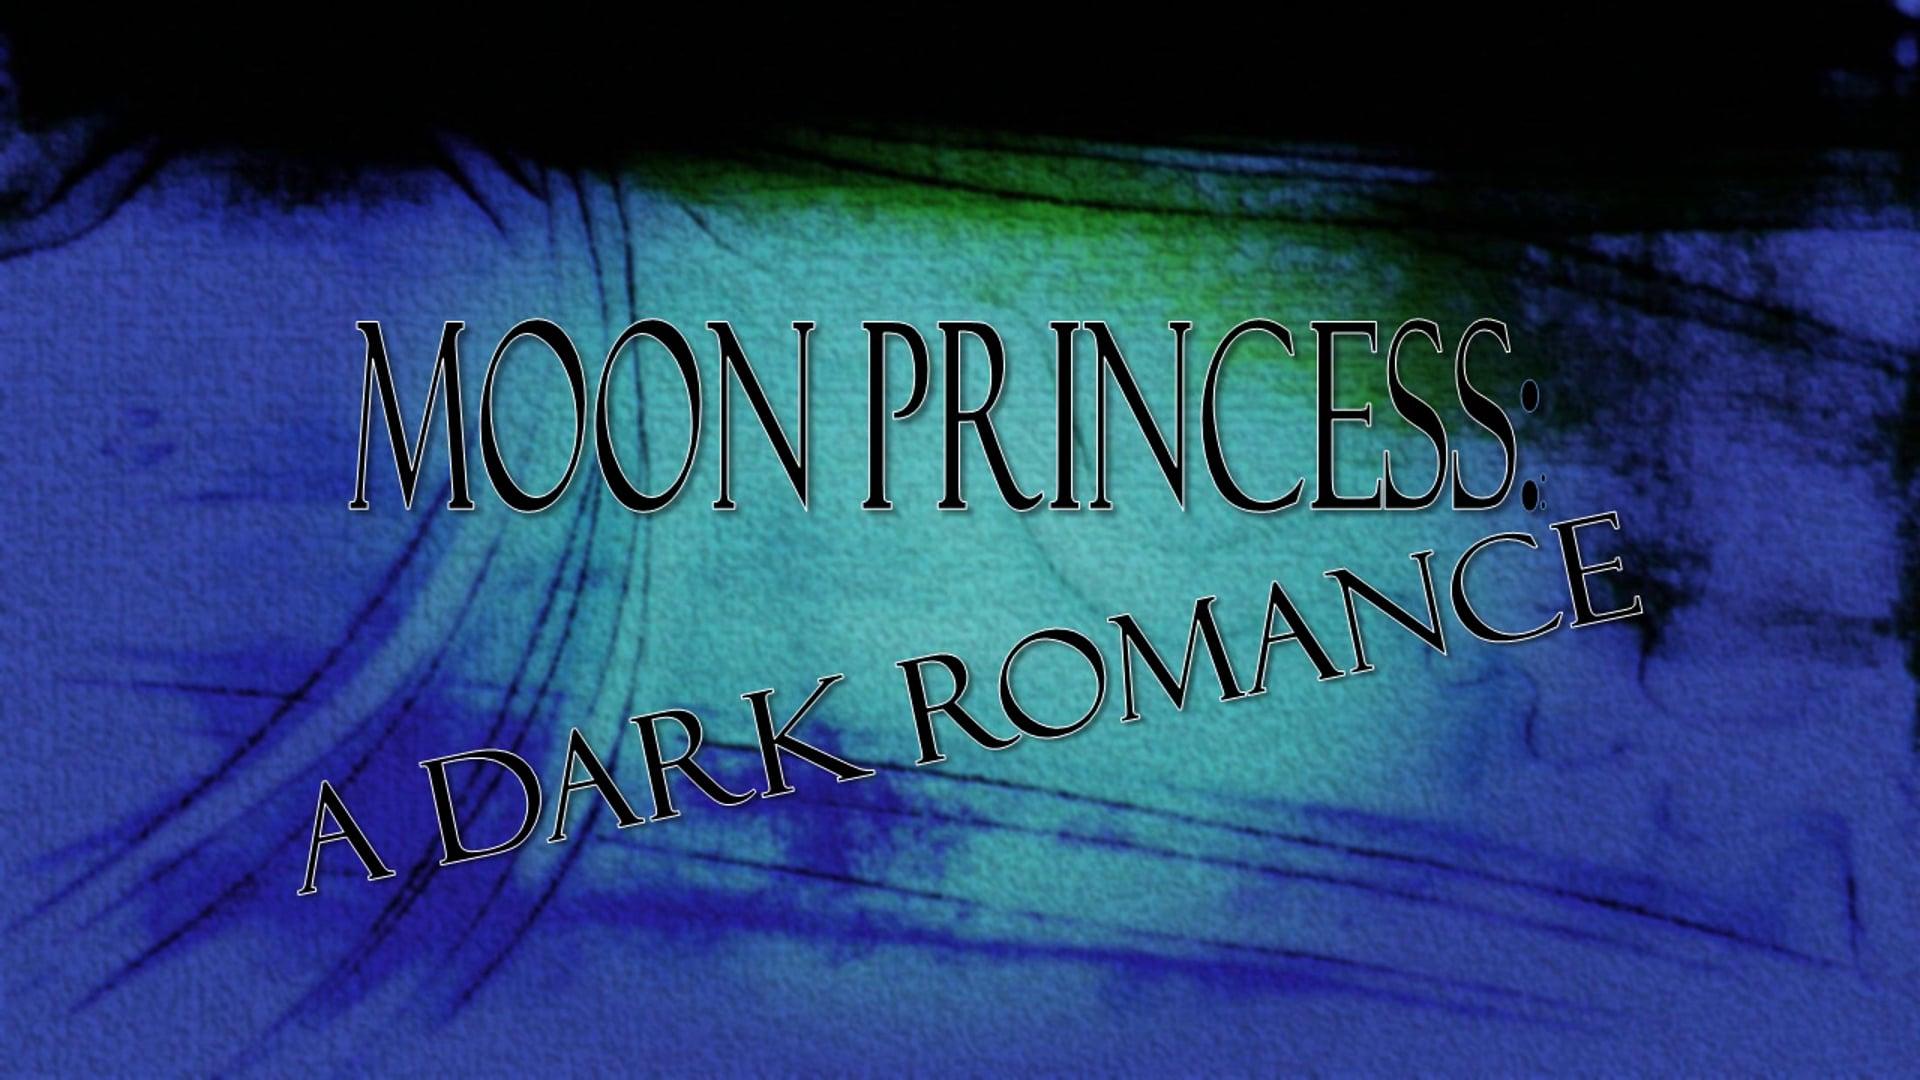 Moon Princess: A Dark Romance